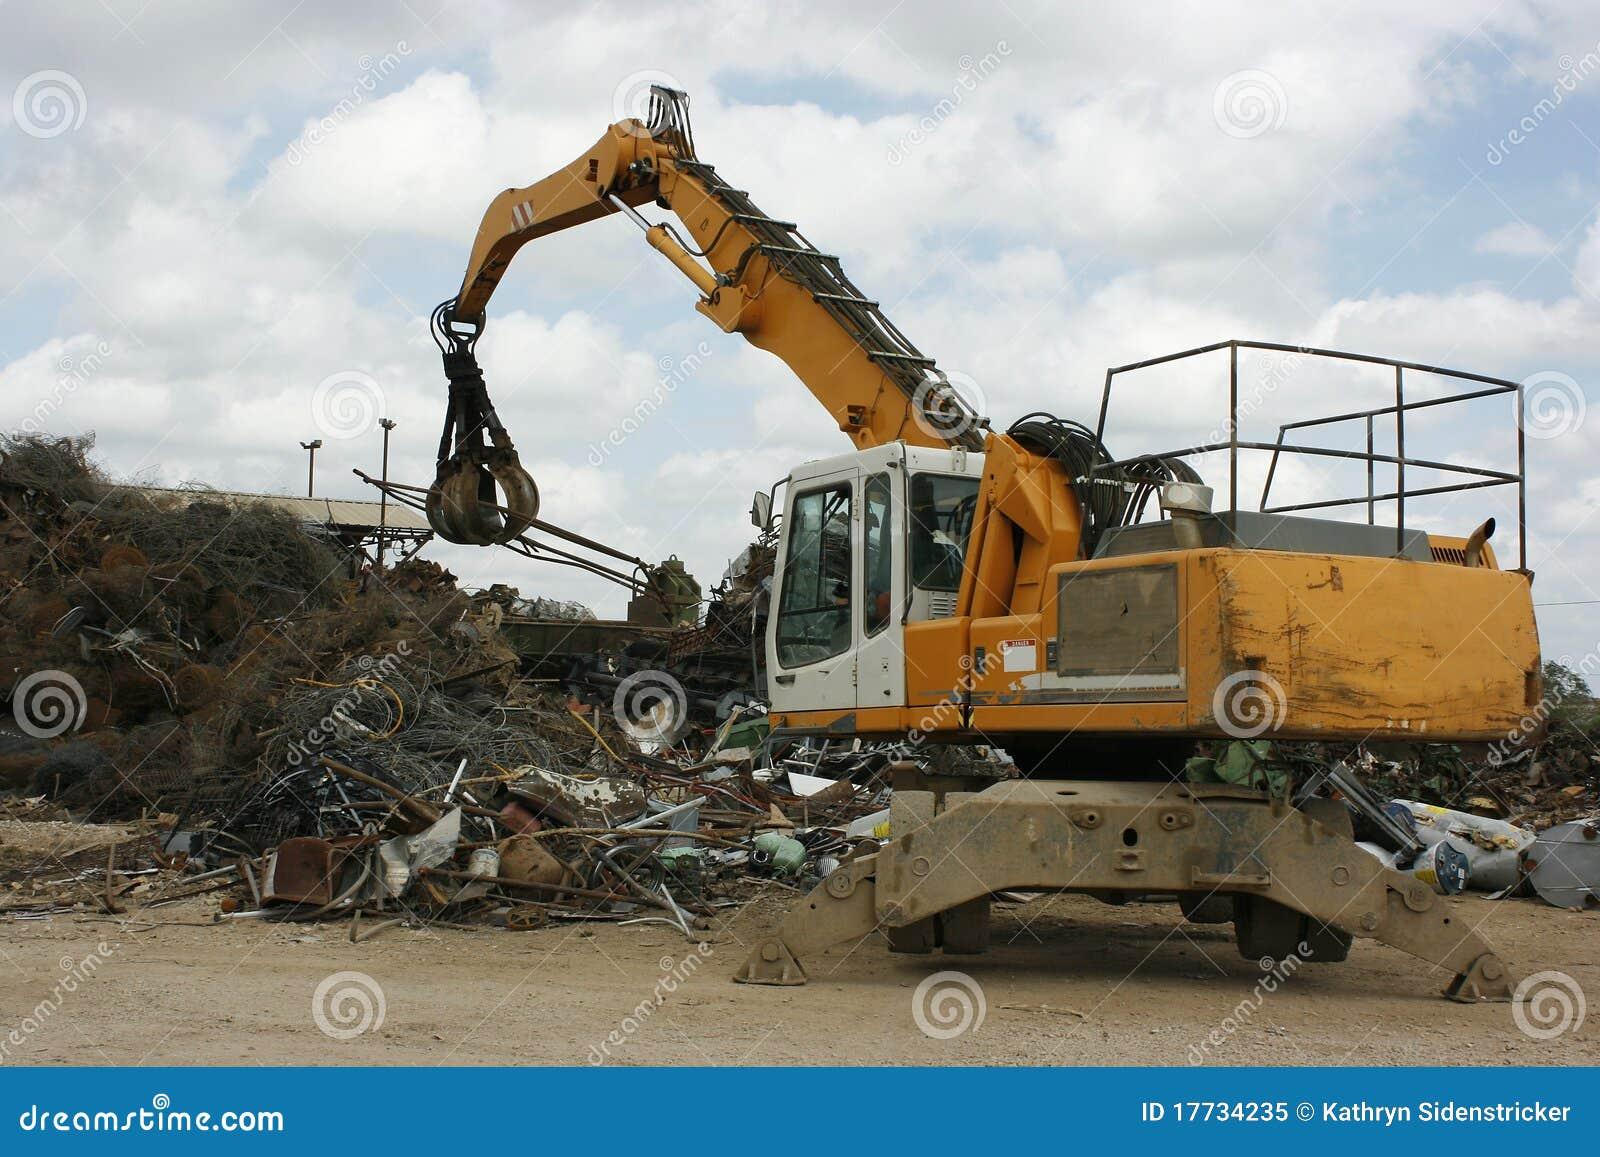 reg the scrapyard crane - photo #9